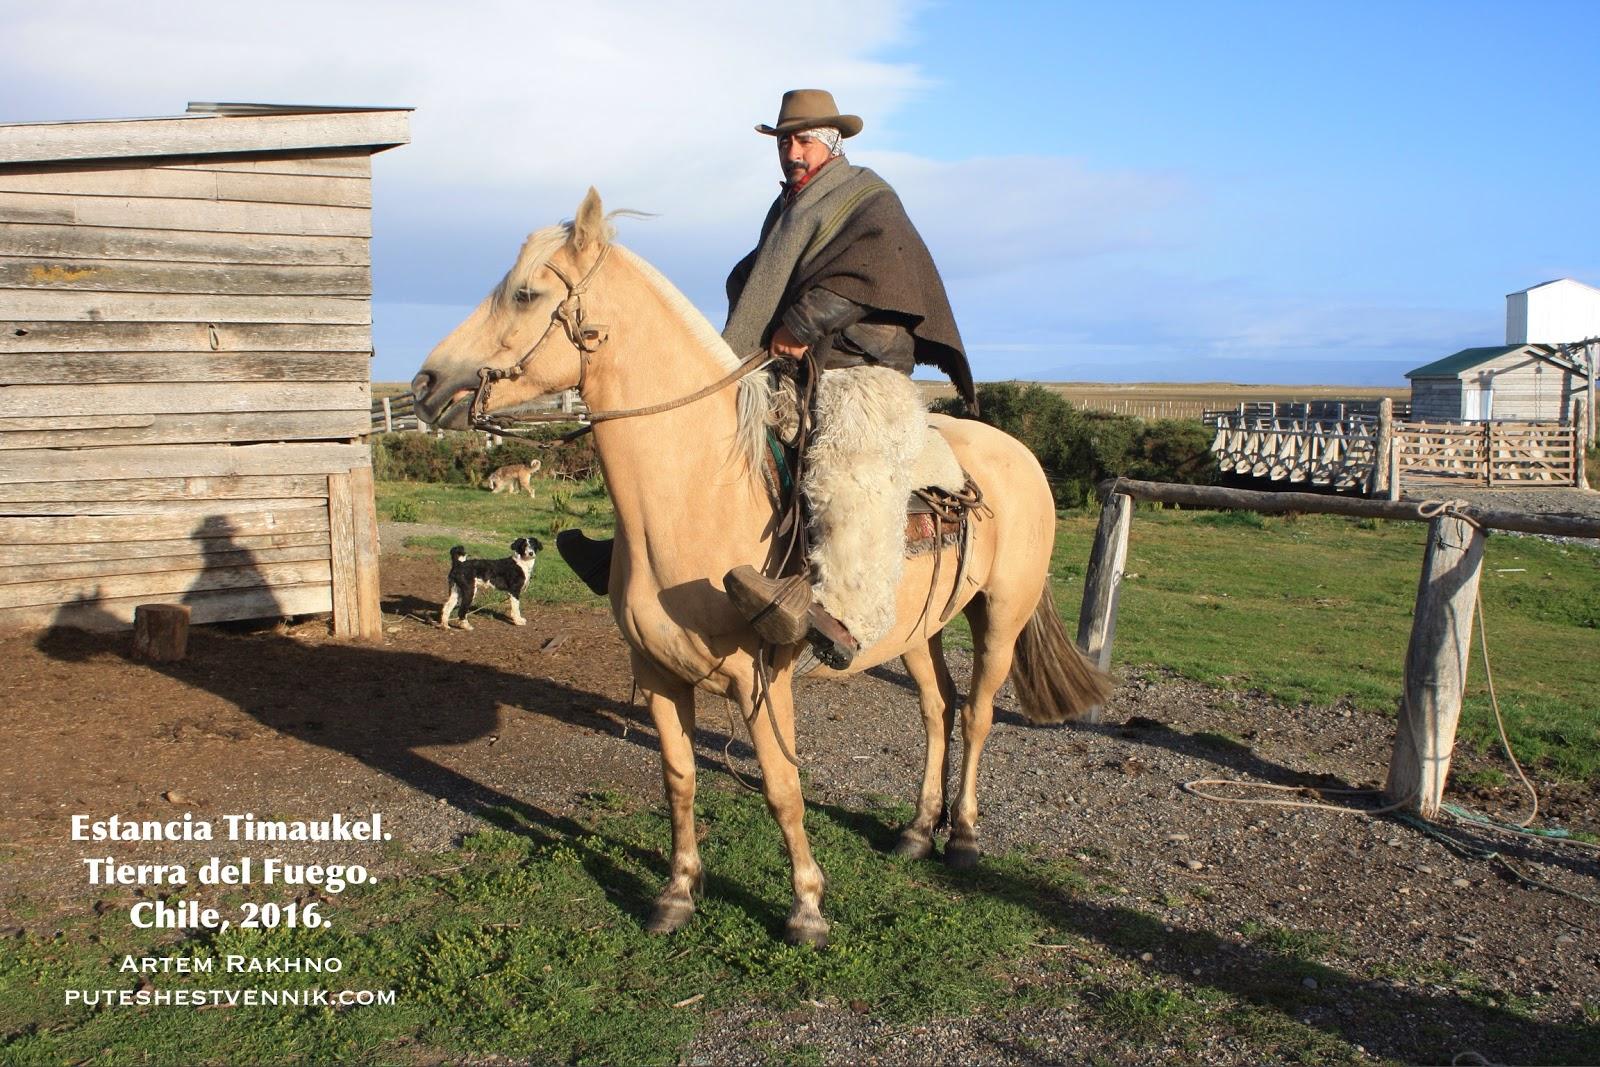 Гаучо в шляпе верхом на лошади